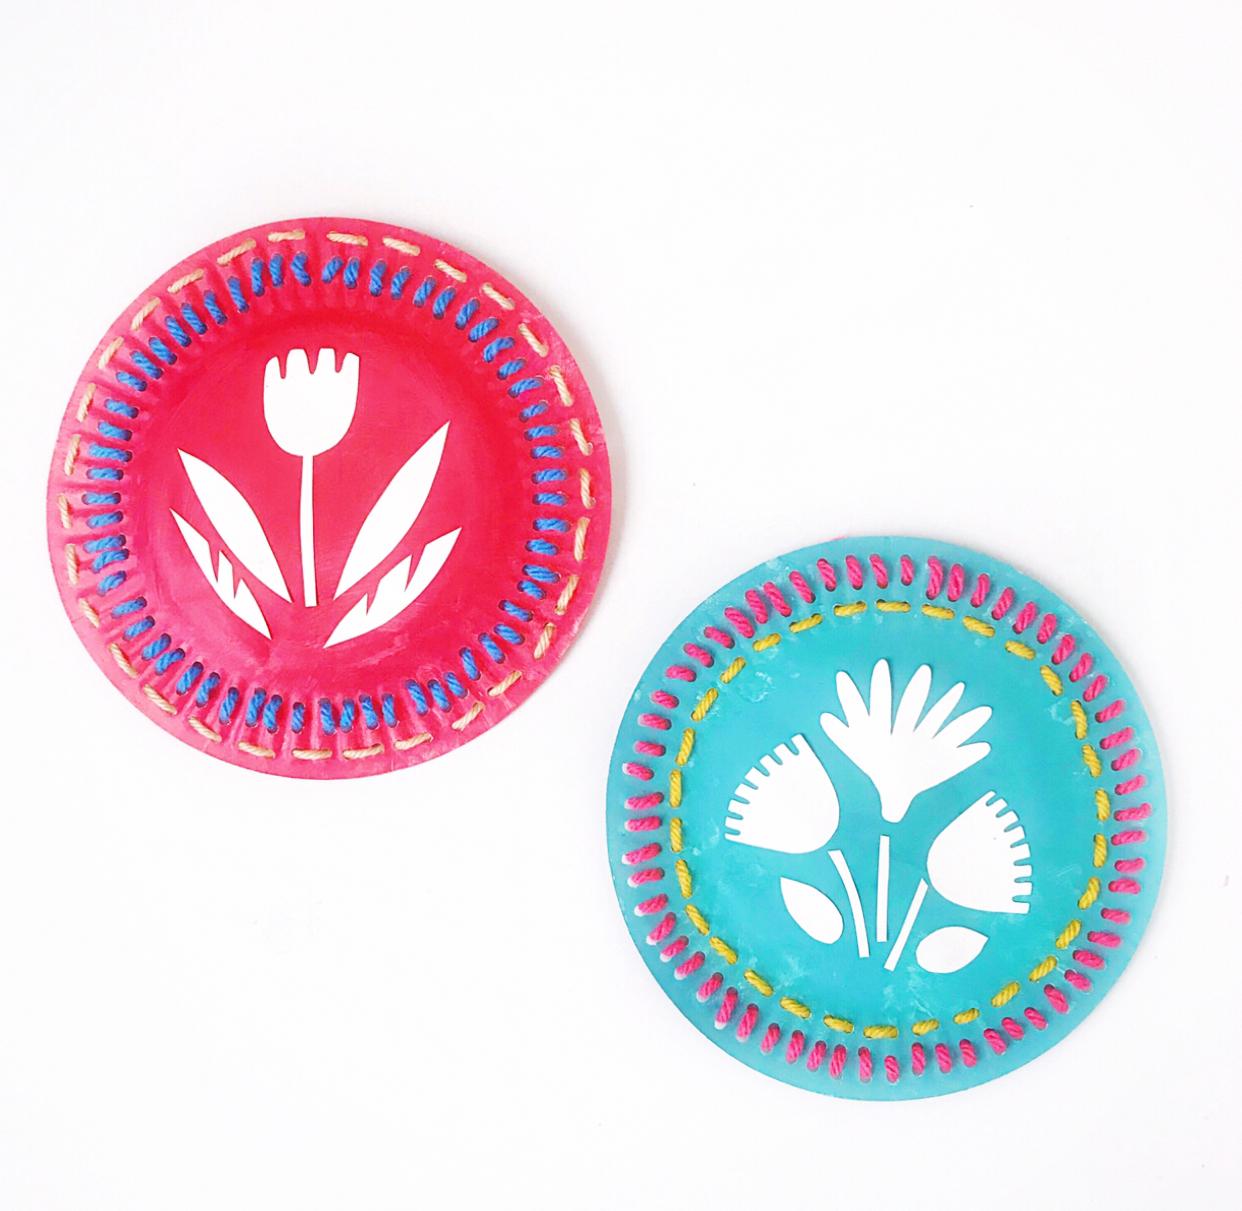 Folk Art Sewing Plate